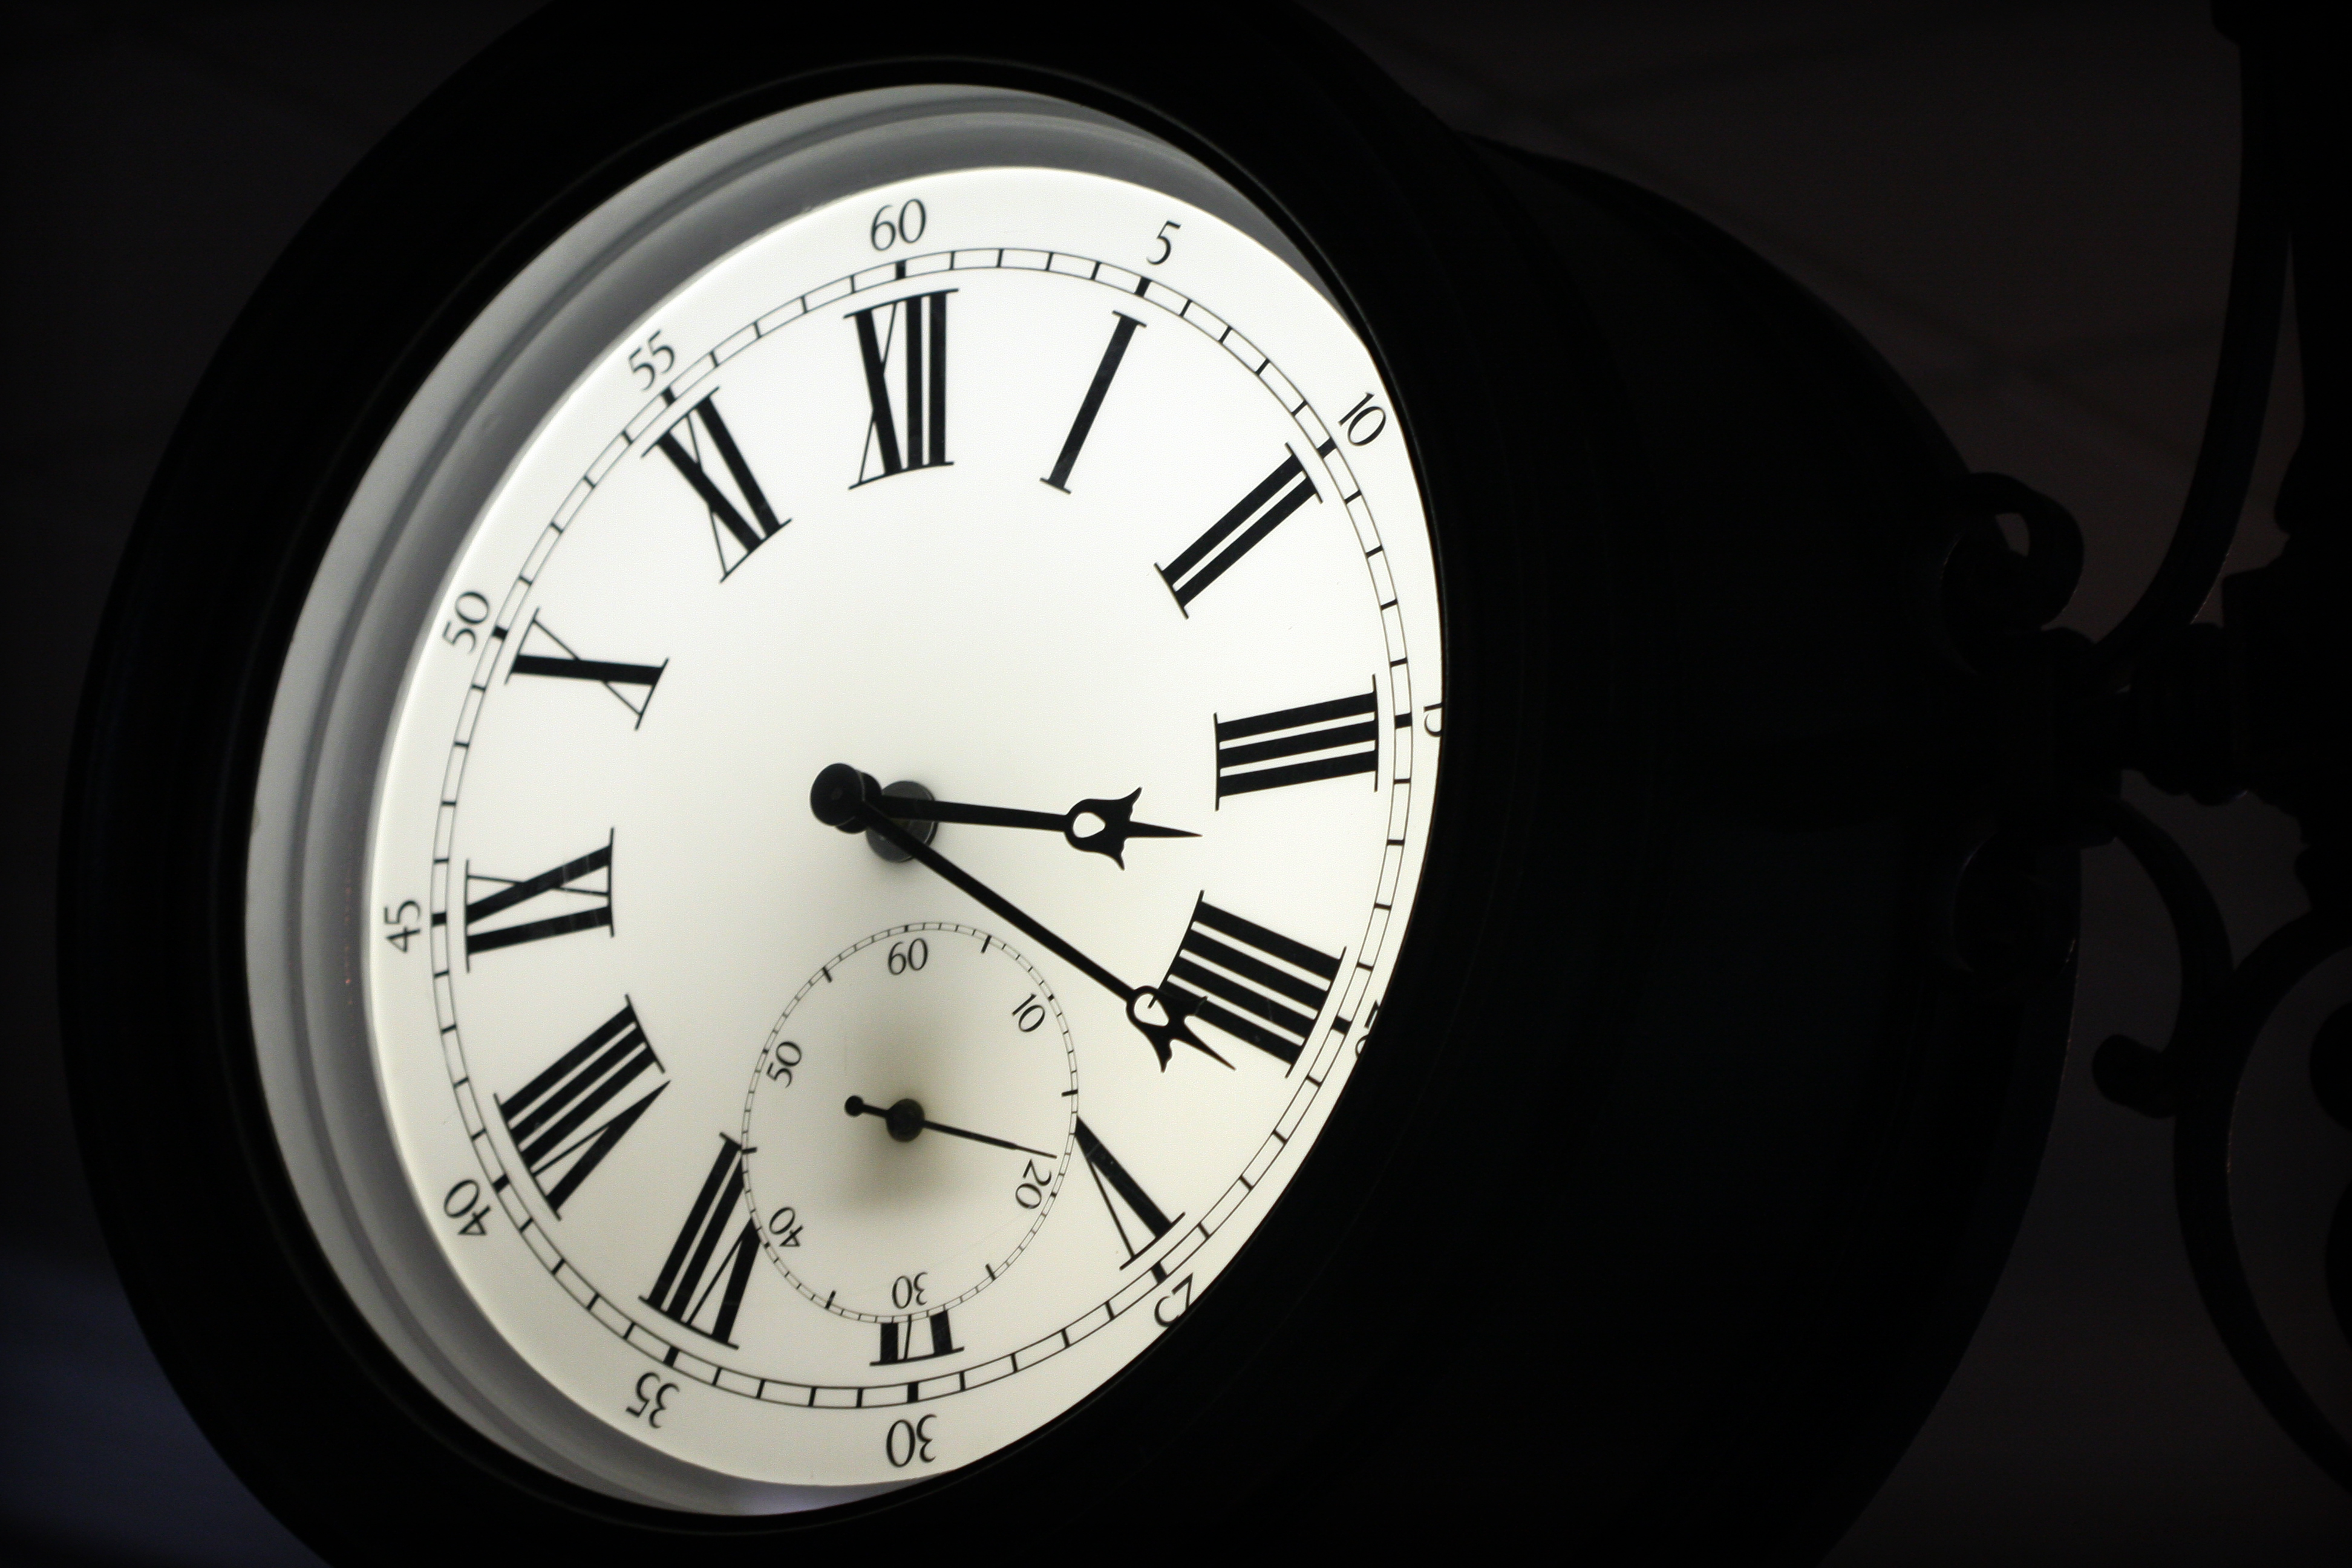 Roman Clock, Antique, Black, Clock, Hours, HQ Photo